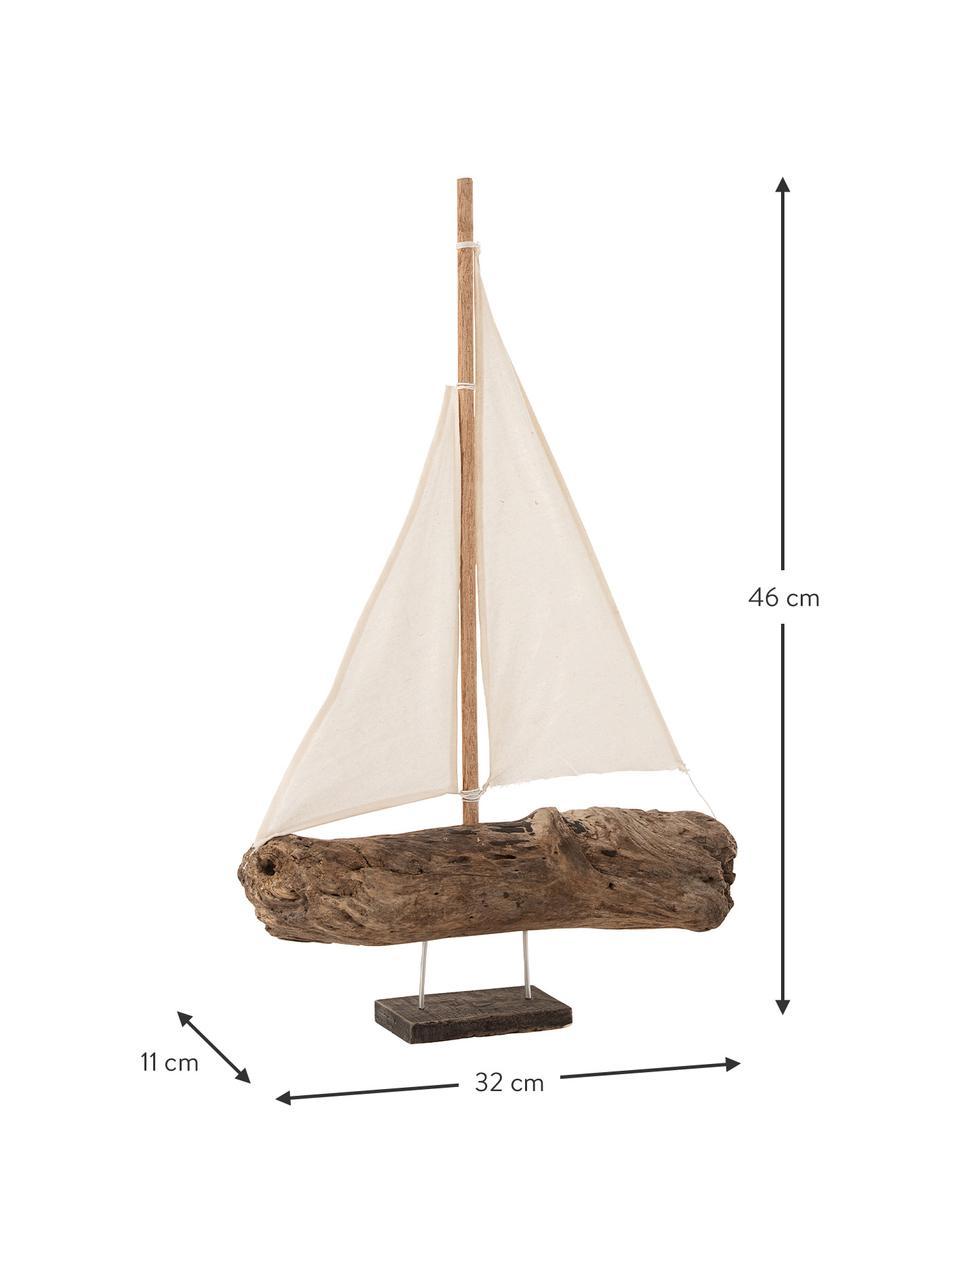 Deko-Objekt Sailboat, Holz, Braun, Beige, 32 x 46 cm